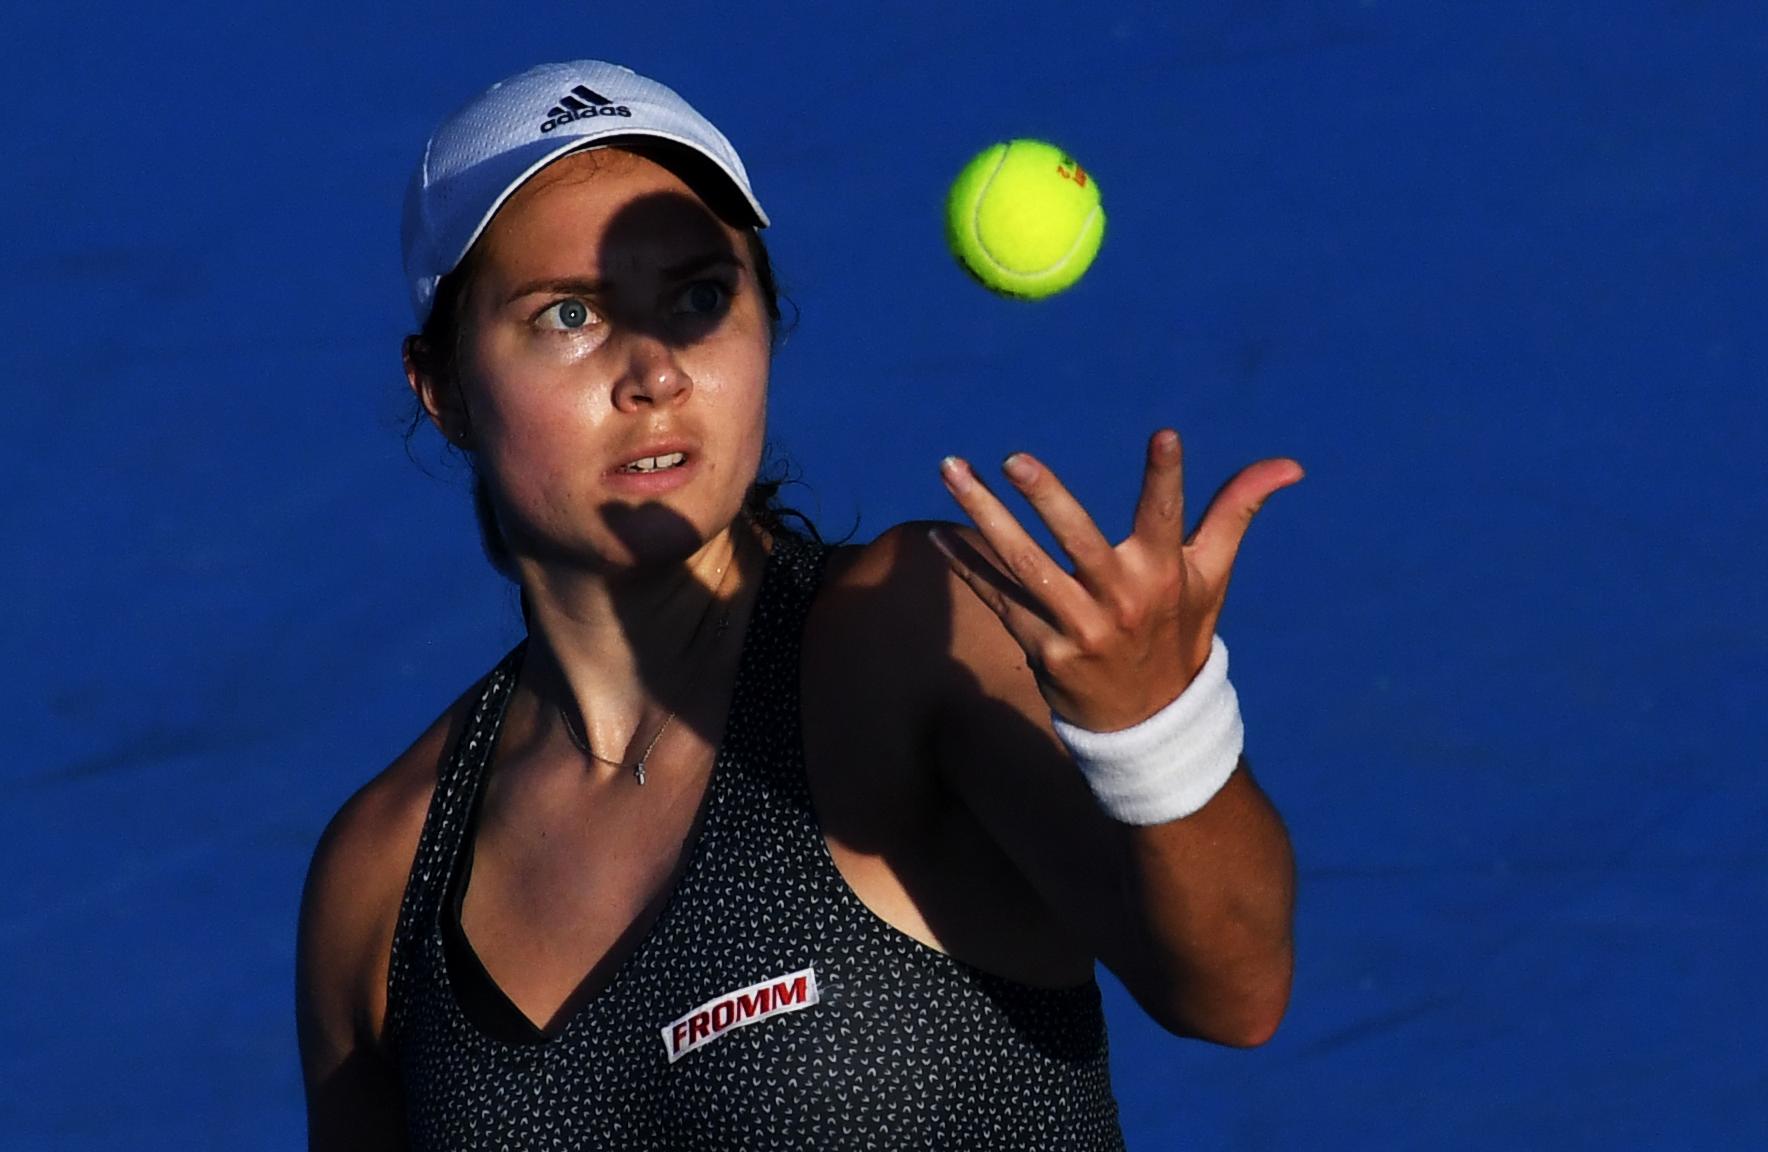 Stefanie Voegele rejoint Tsurenko en finale